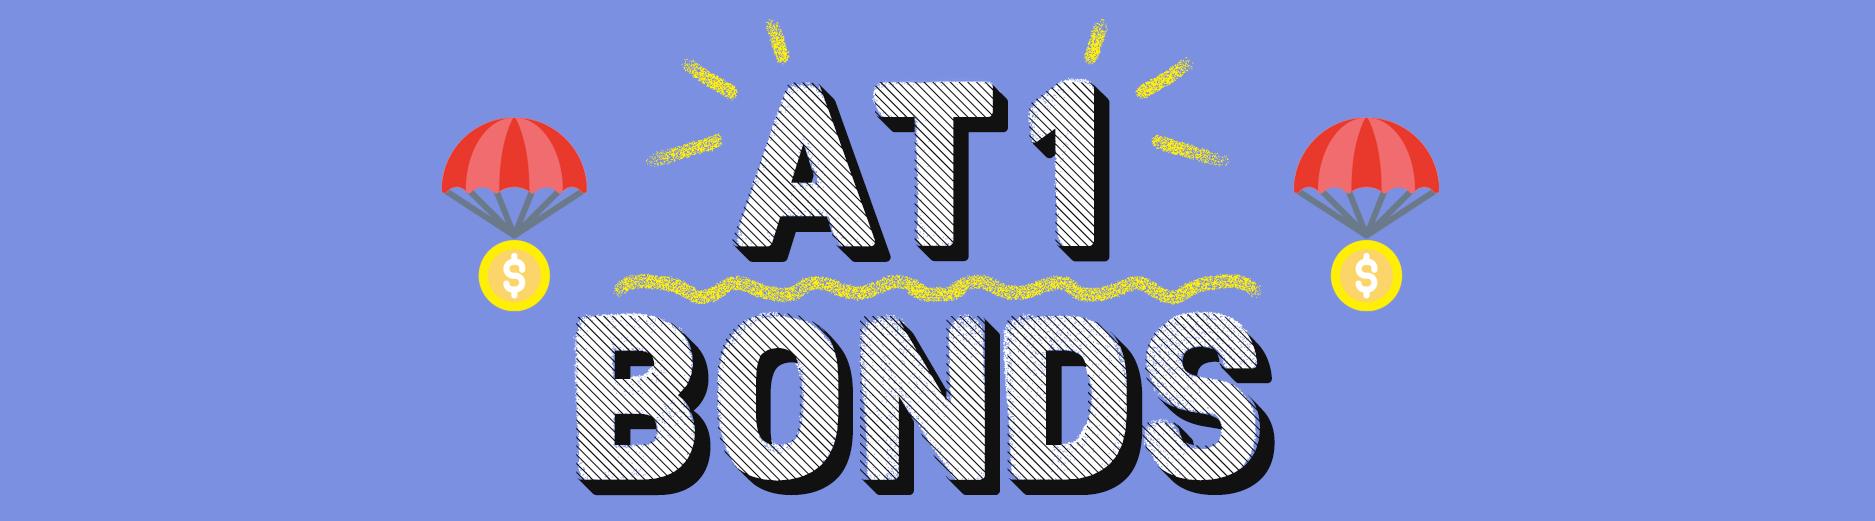 What's an LRCN AT1 bond?